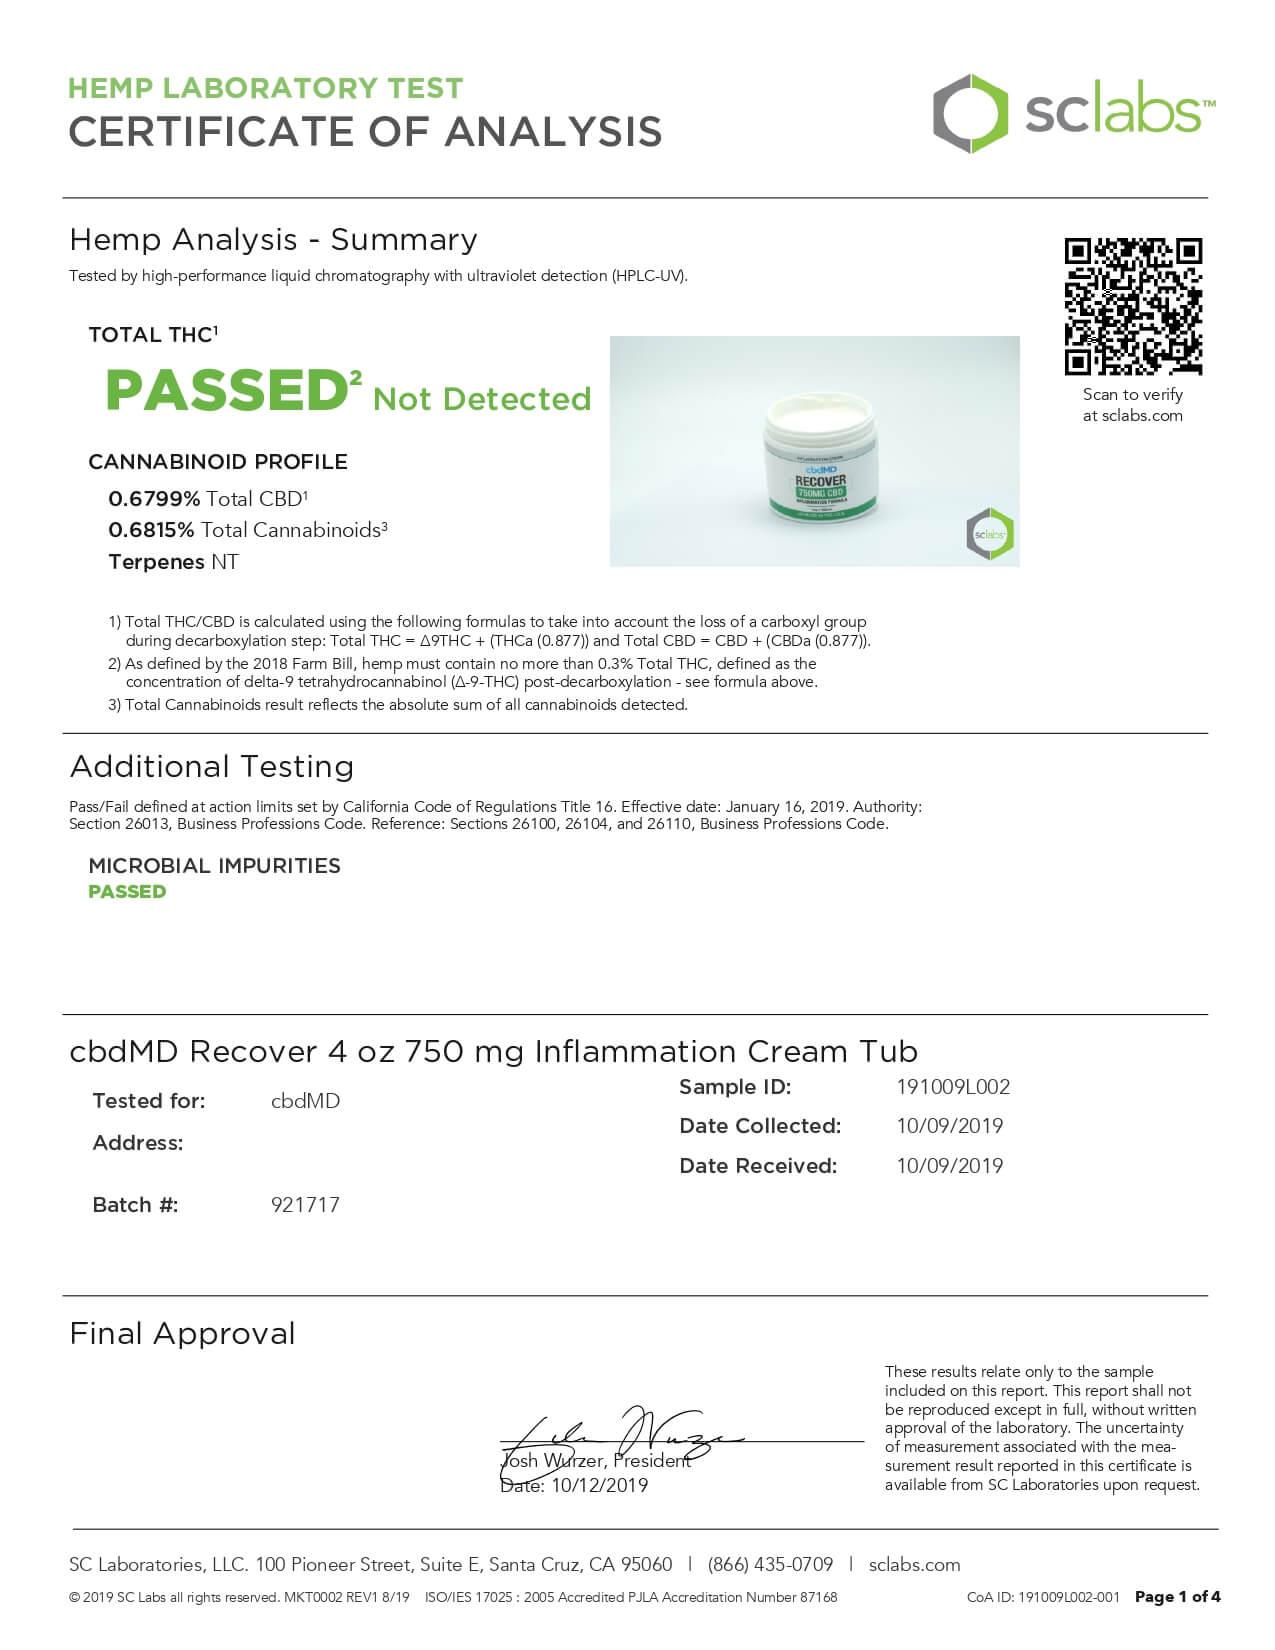 cbdMD CBD Topical Recover Inflammation Cream 4oz Tub 750mg Lab Report